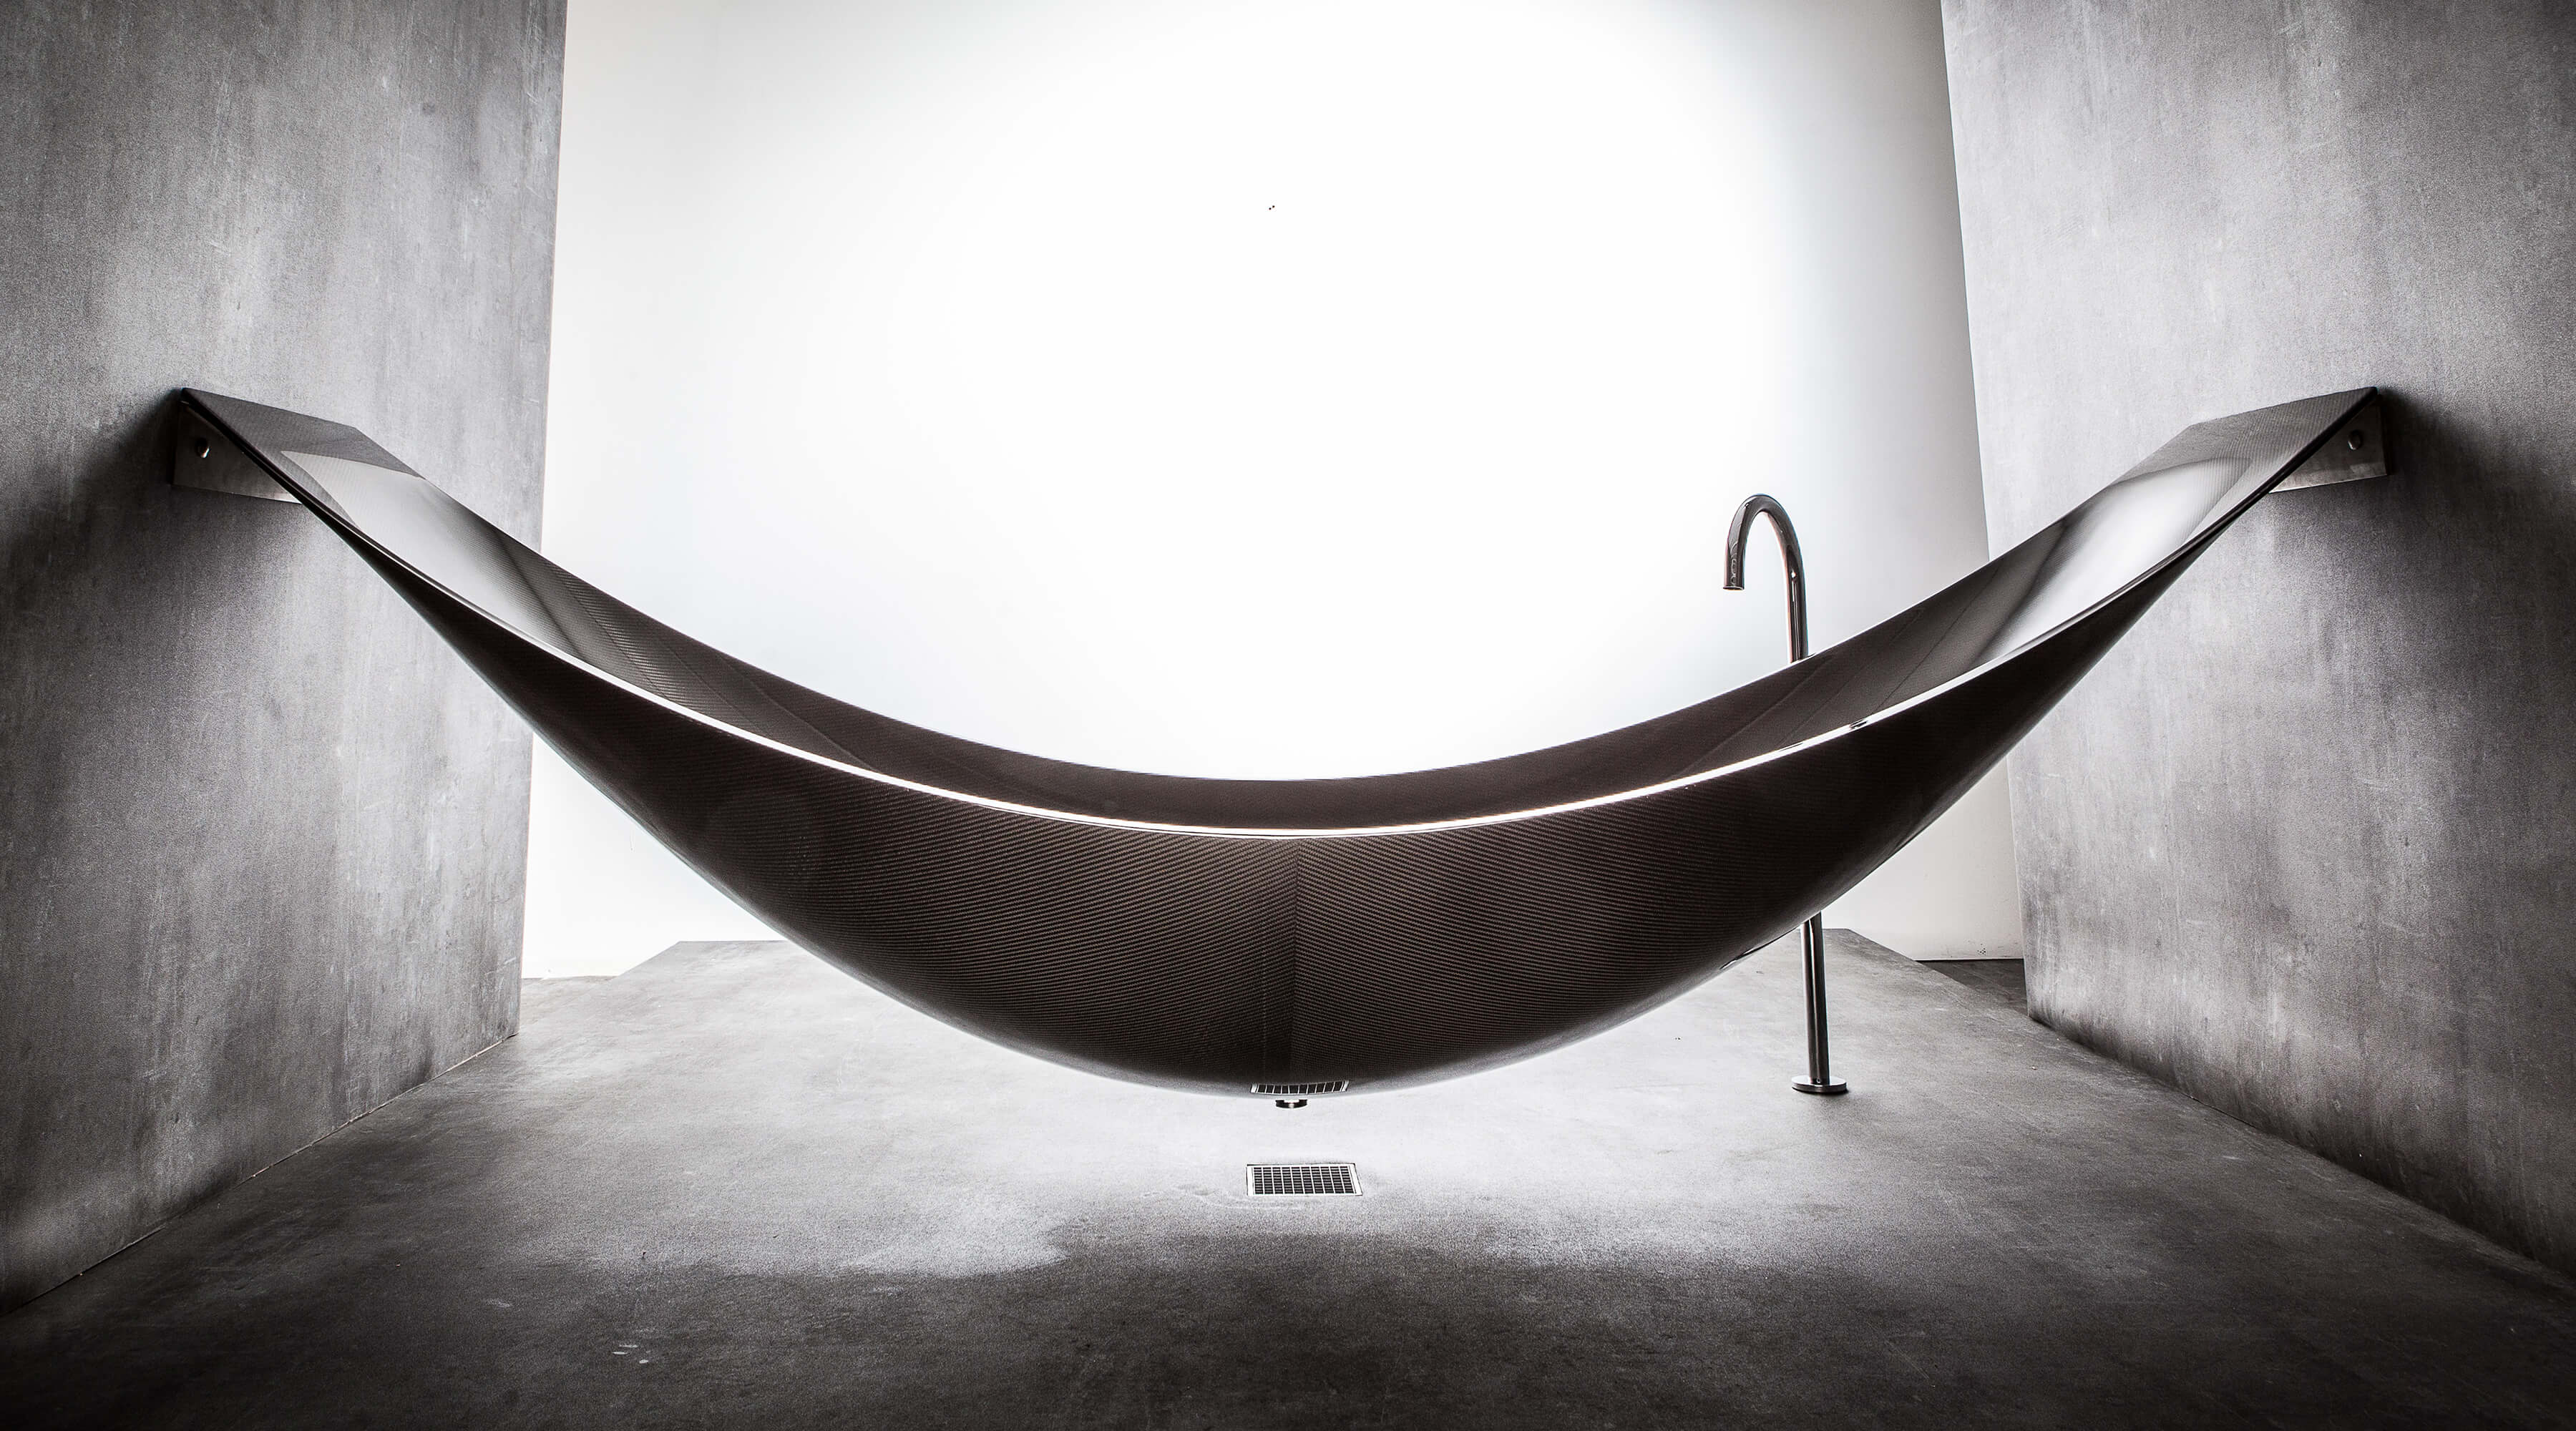 The hammock bath tub manufactured by Splinterworks custom made in black carbon fiber